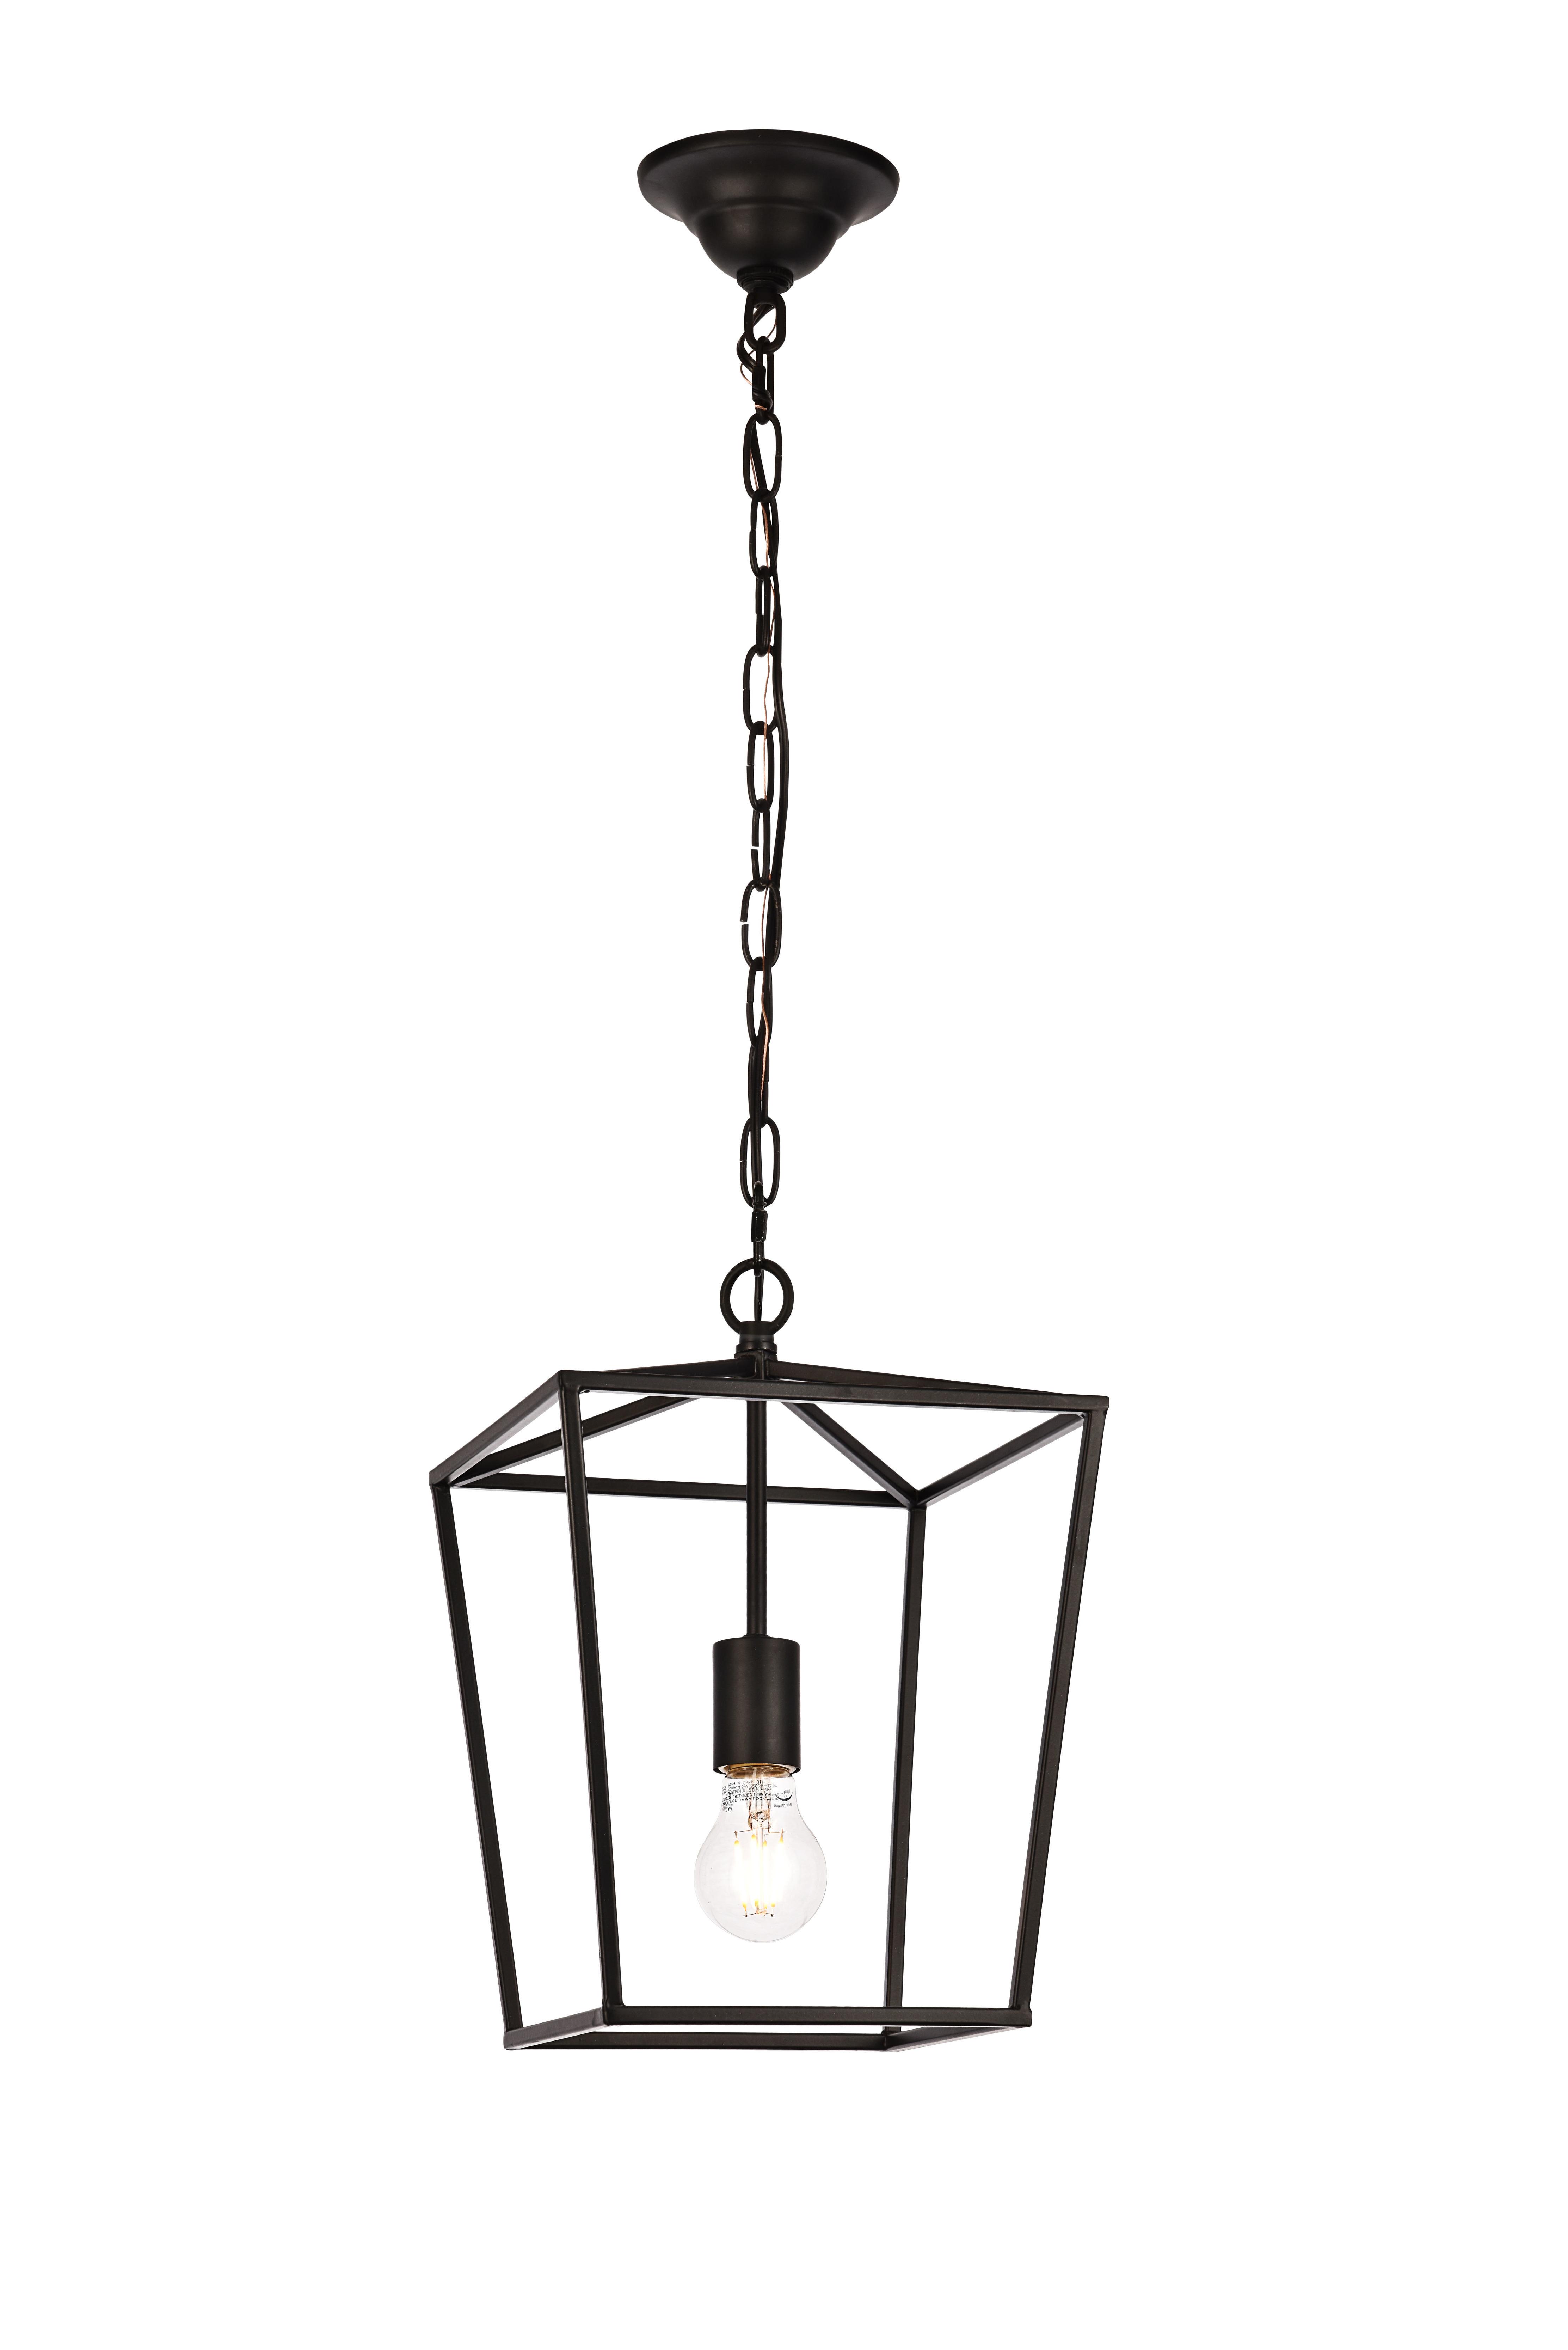 Delon 1 Light Lantern Geometric Pendants Intended For Newest Daphne 1 Light Pendant (Gallery 15 of 20)